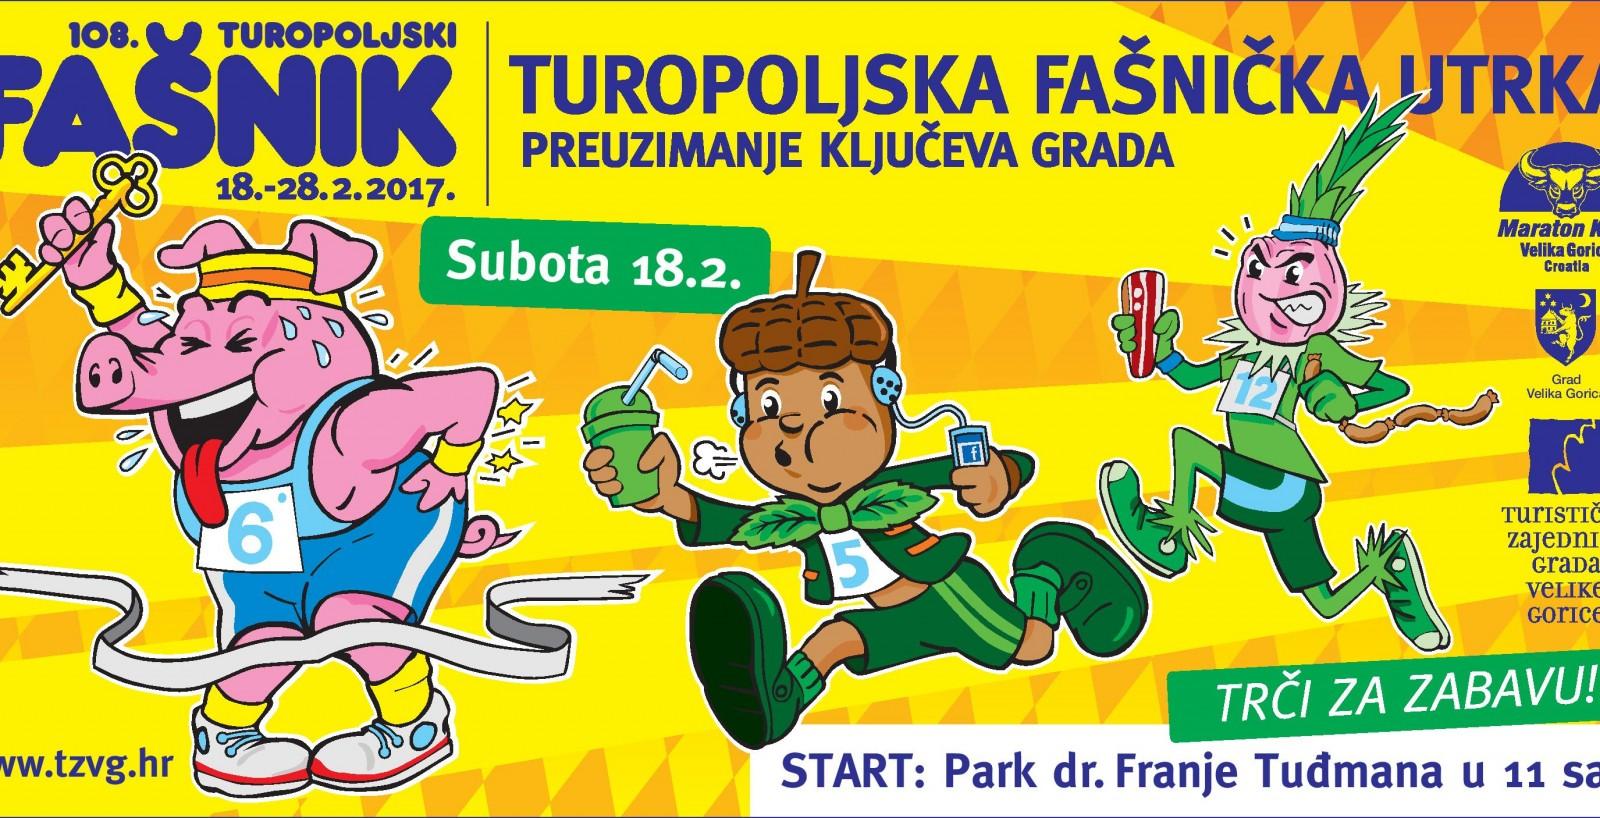 Turopoljska fašnička utrka - trkom do ključa!